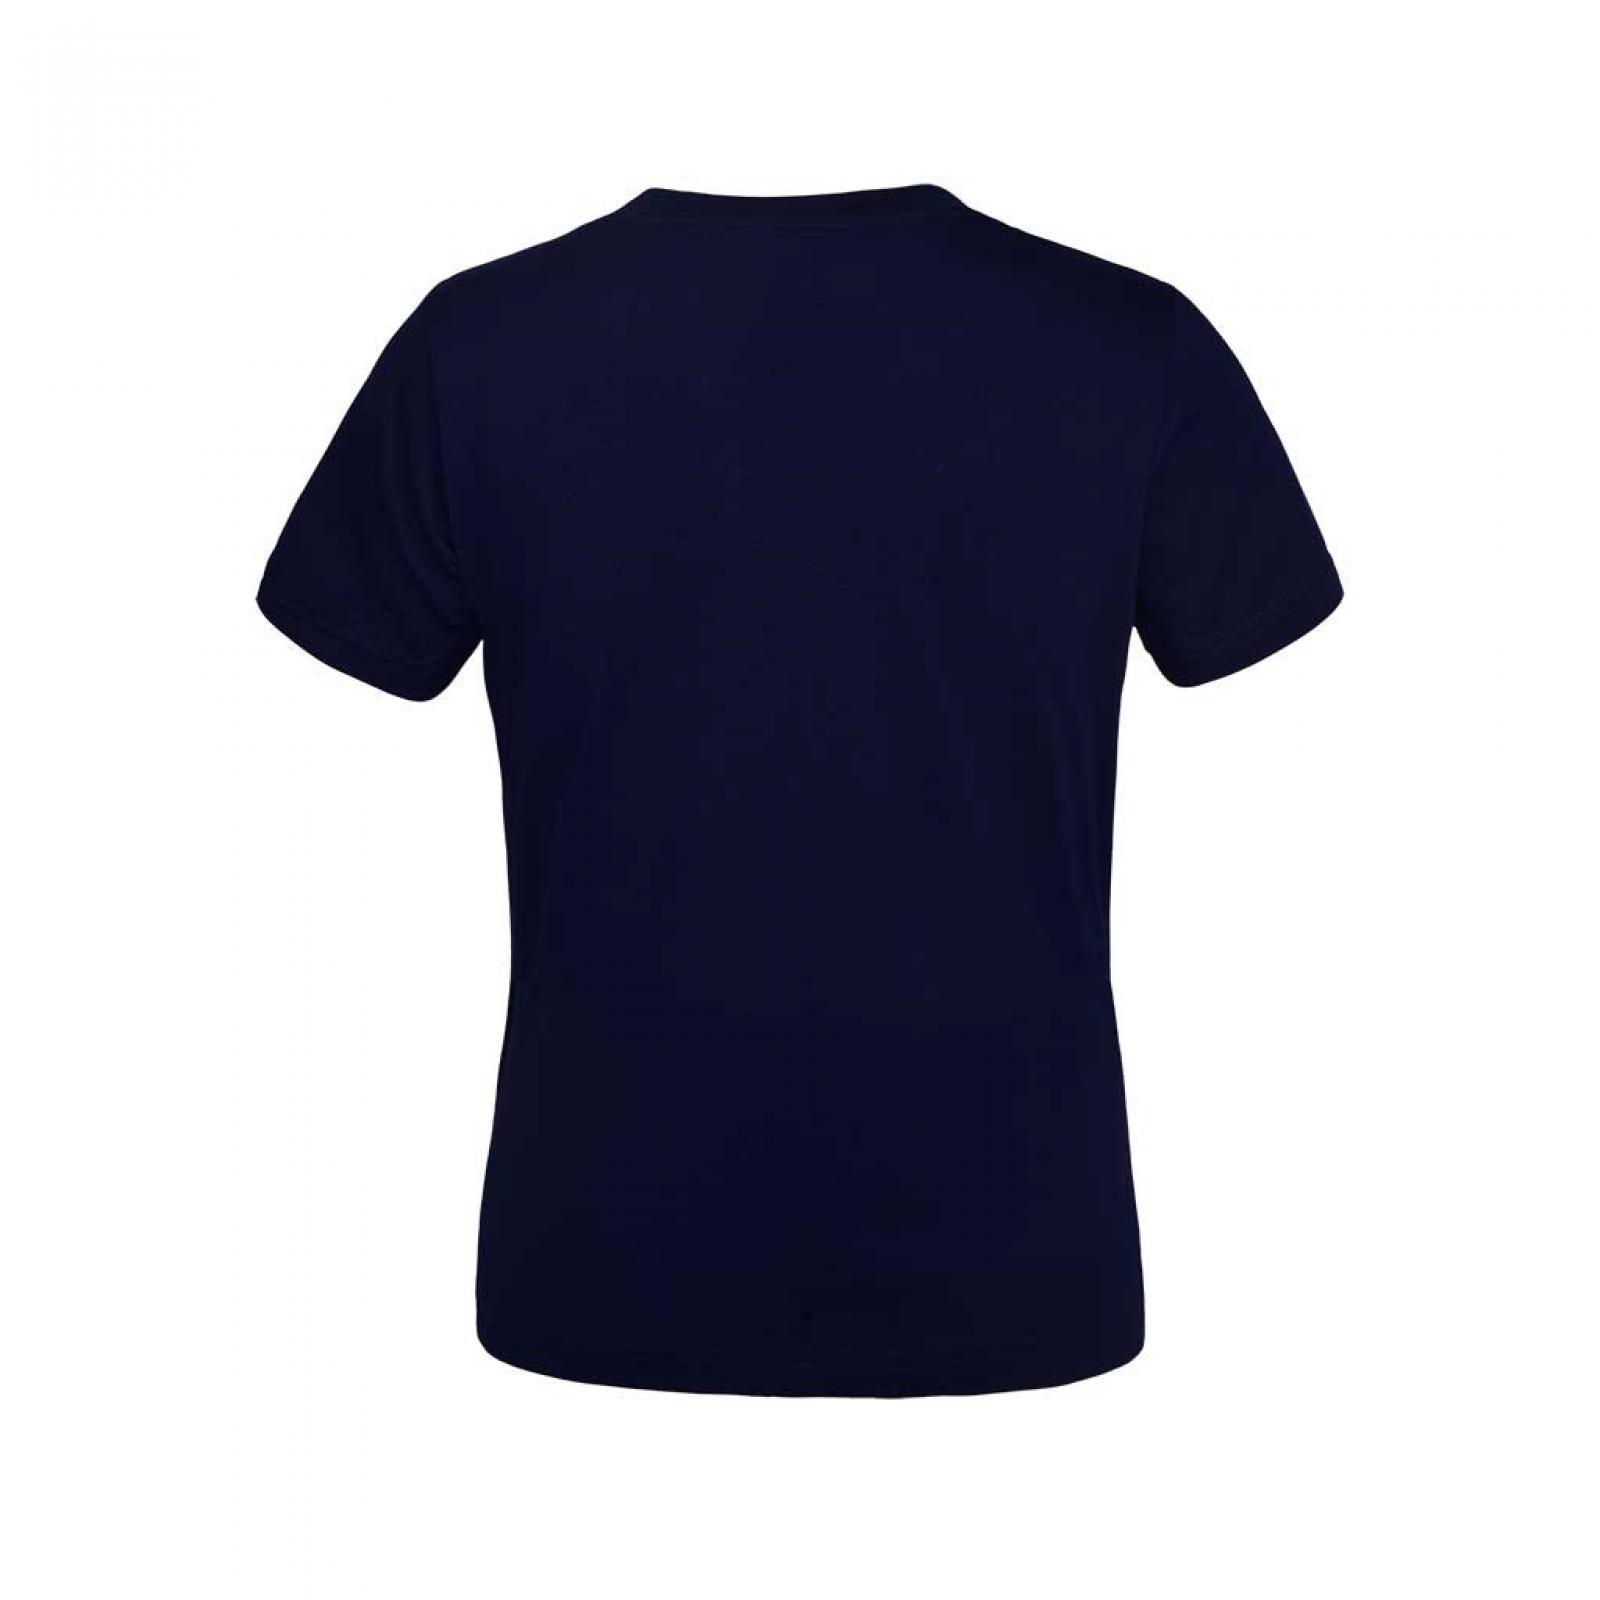 Kingsland Lalita Navy T-Shirt